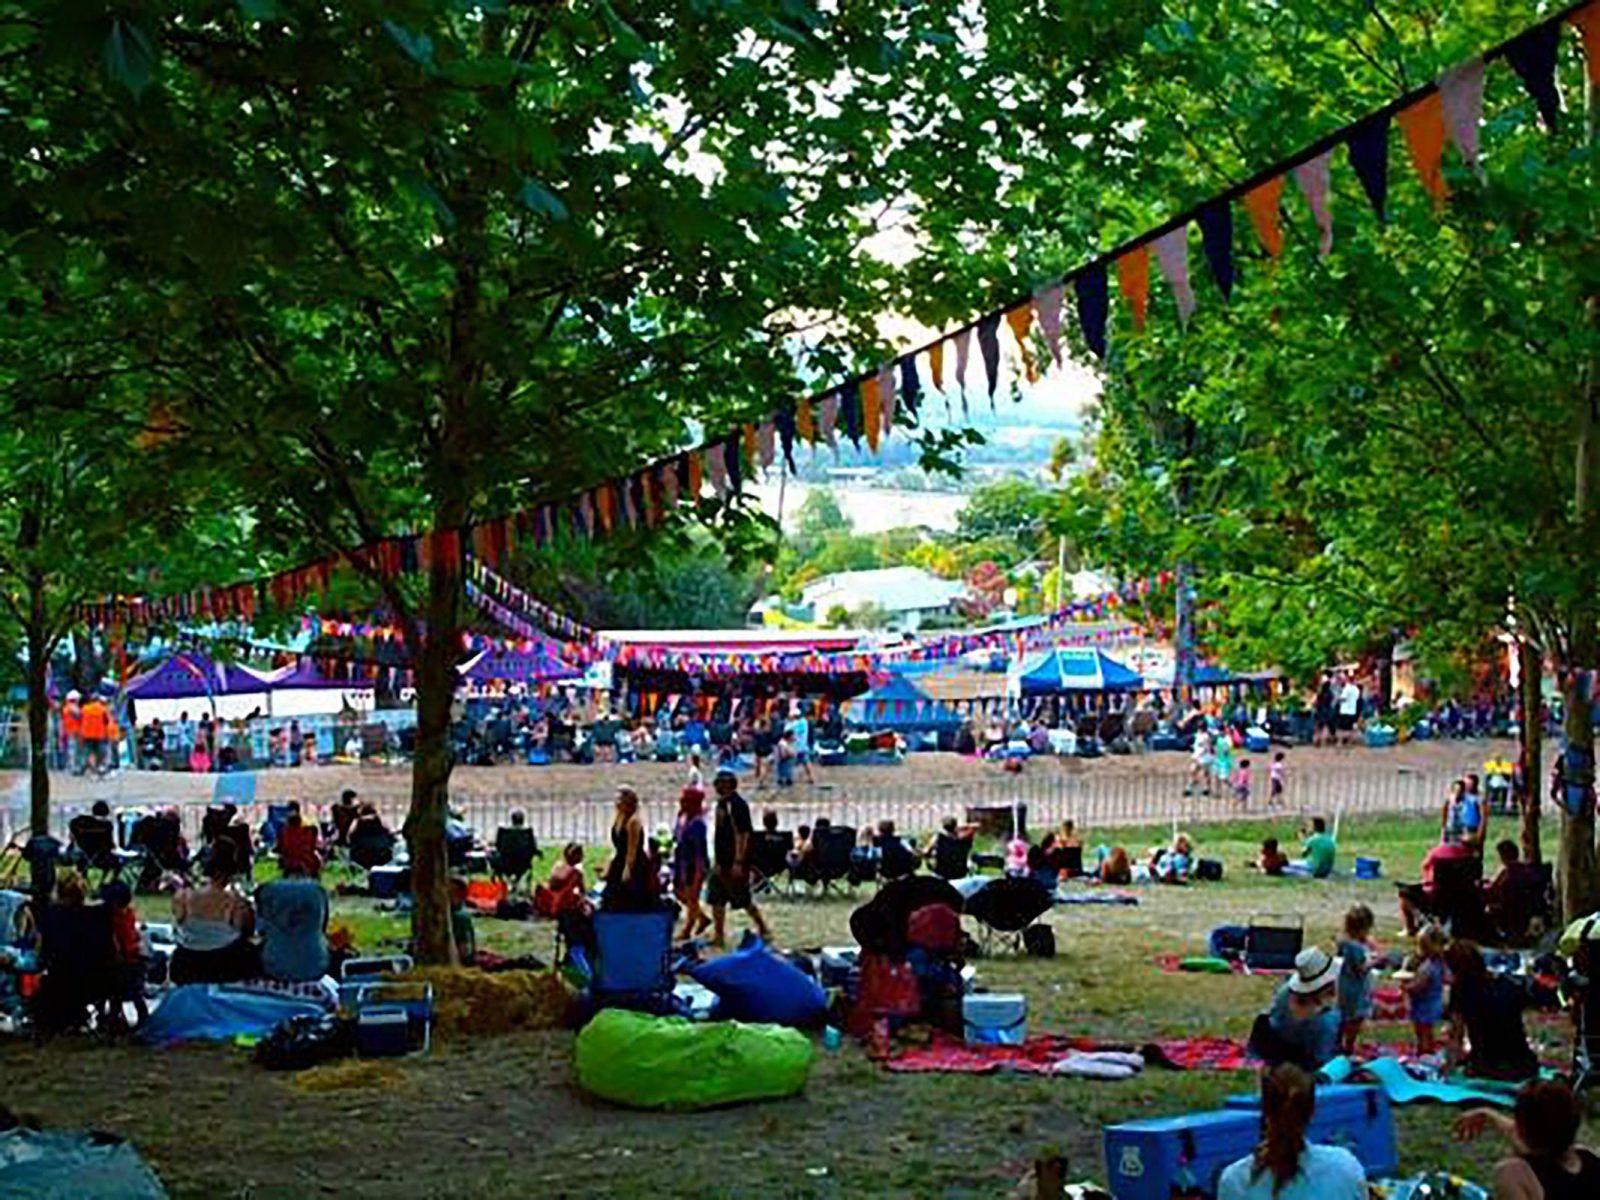 Gather Festival